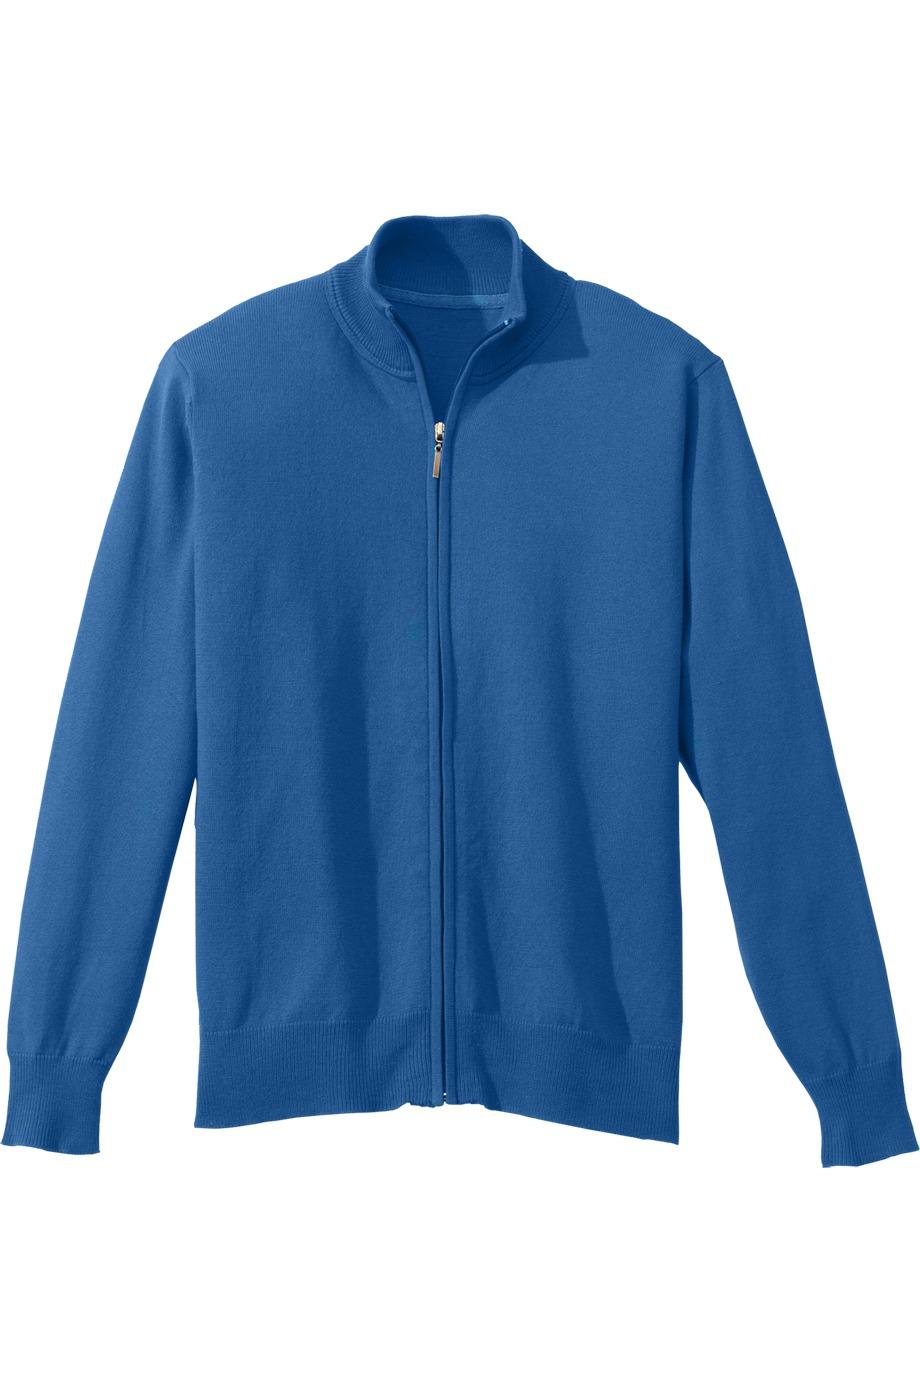 Edwards Garment 064 - Women's Full Zip Cardigan